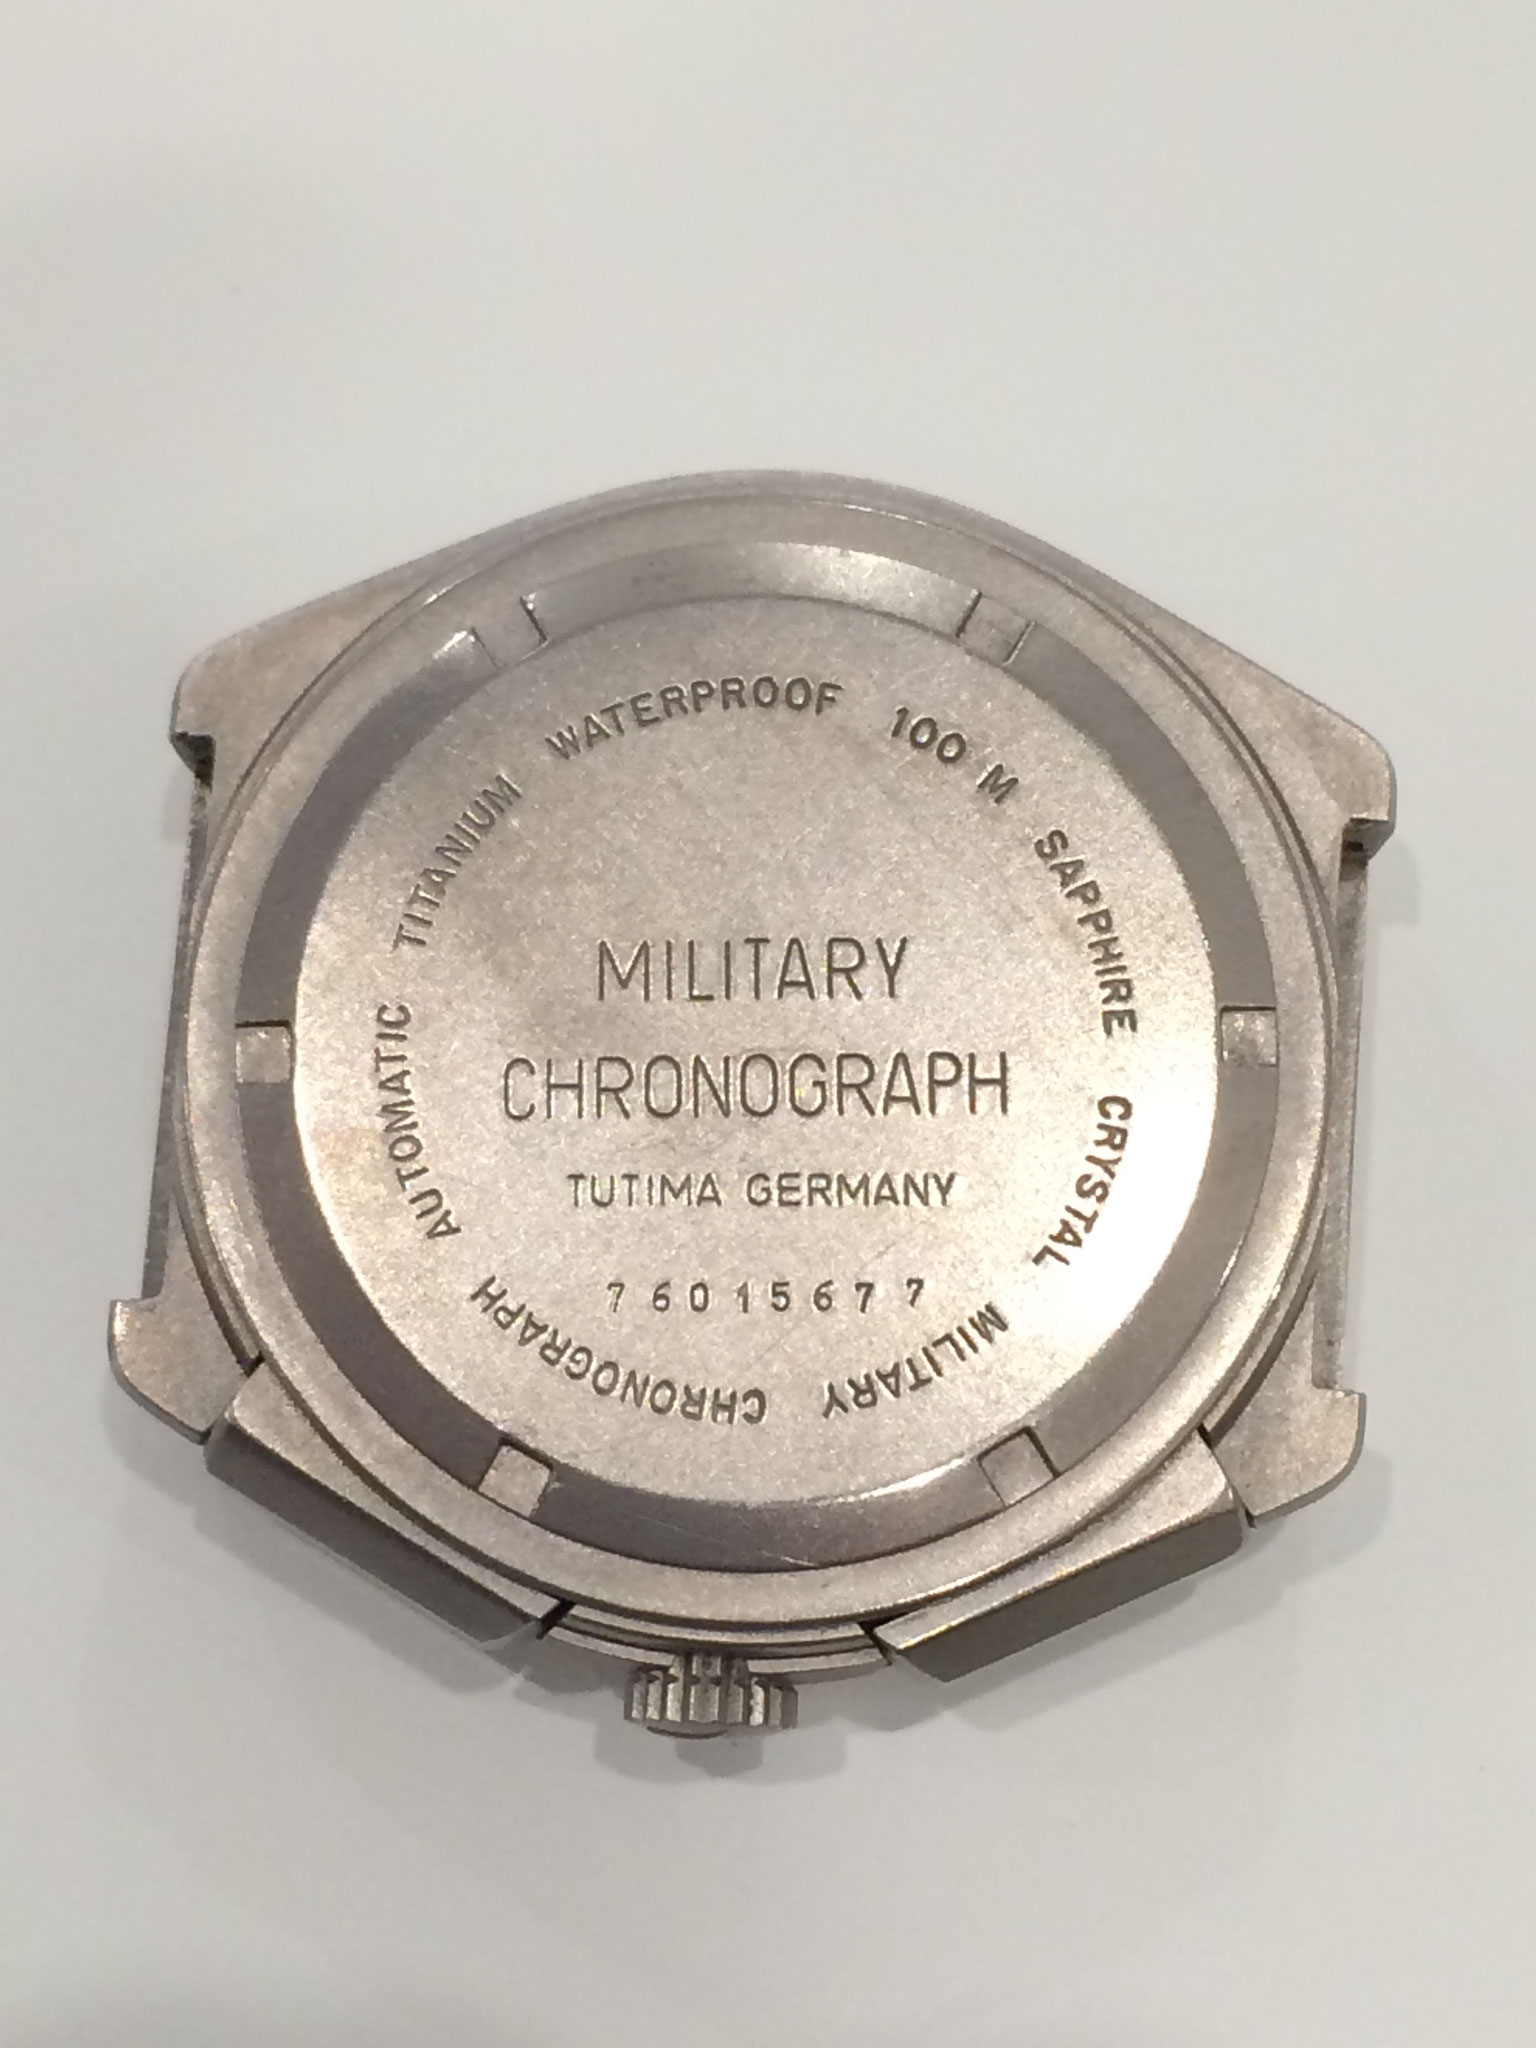 Tutima Military Chronograph Gehäuse Ref. 798